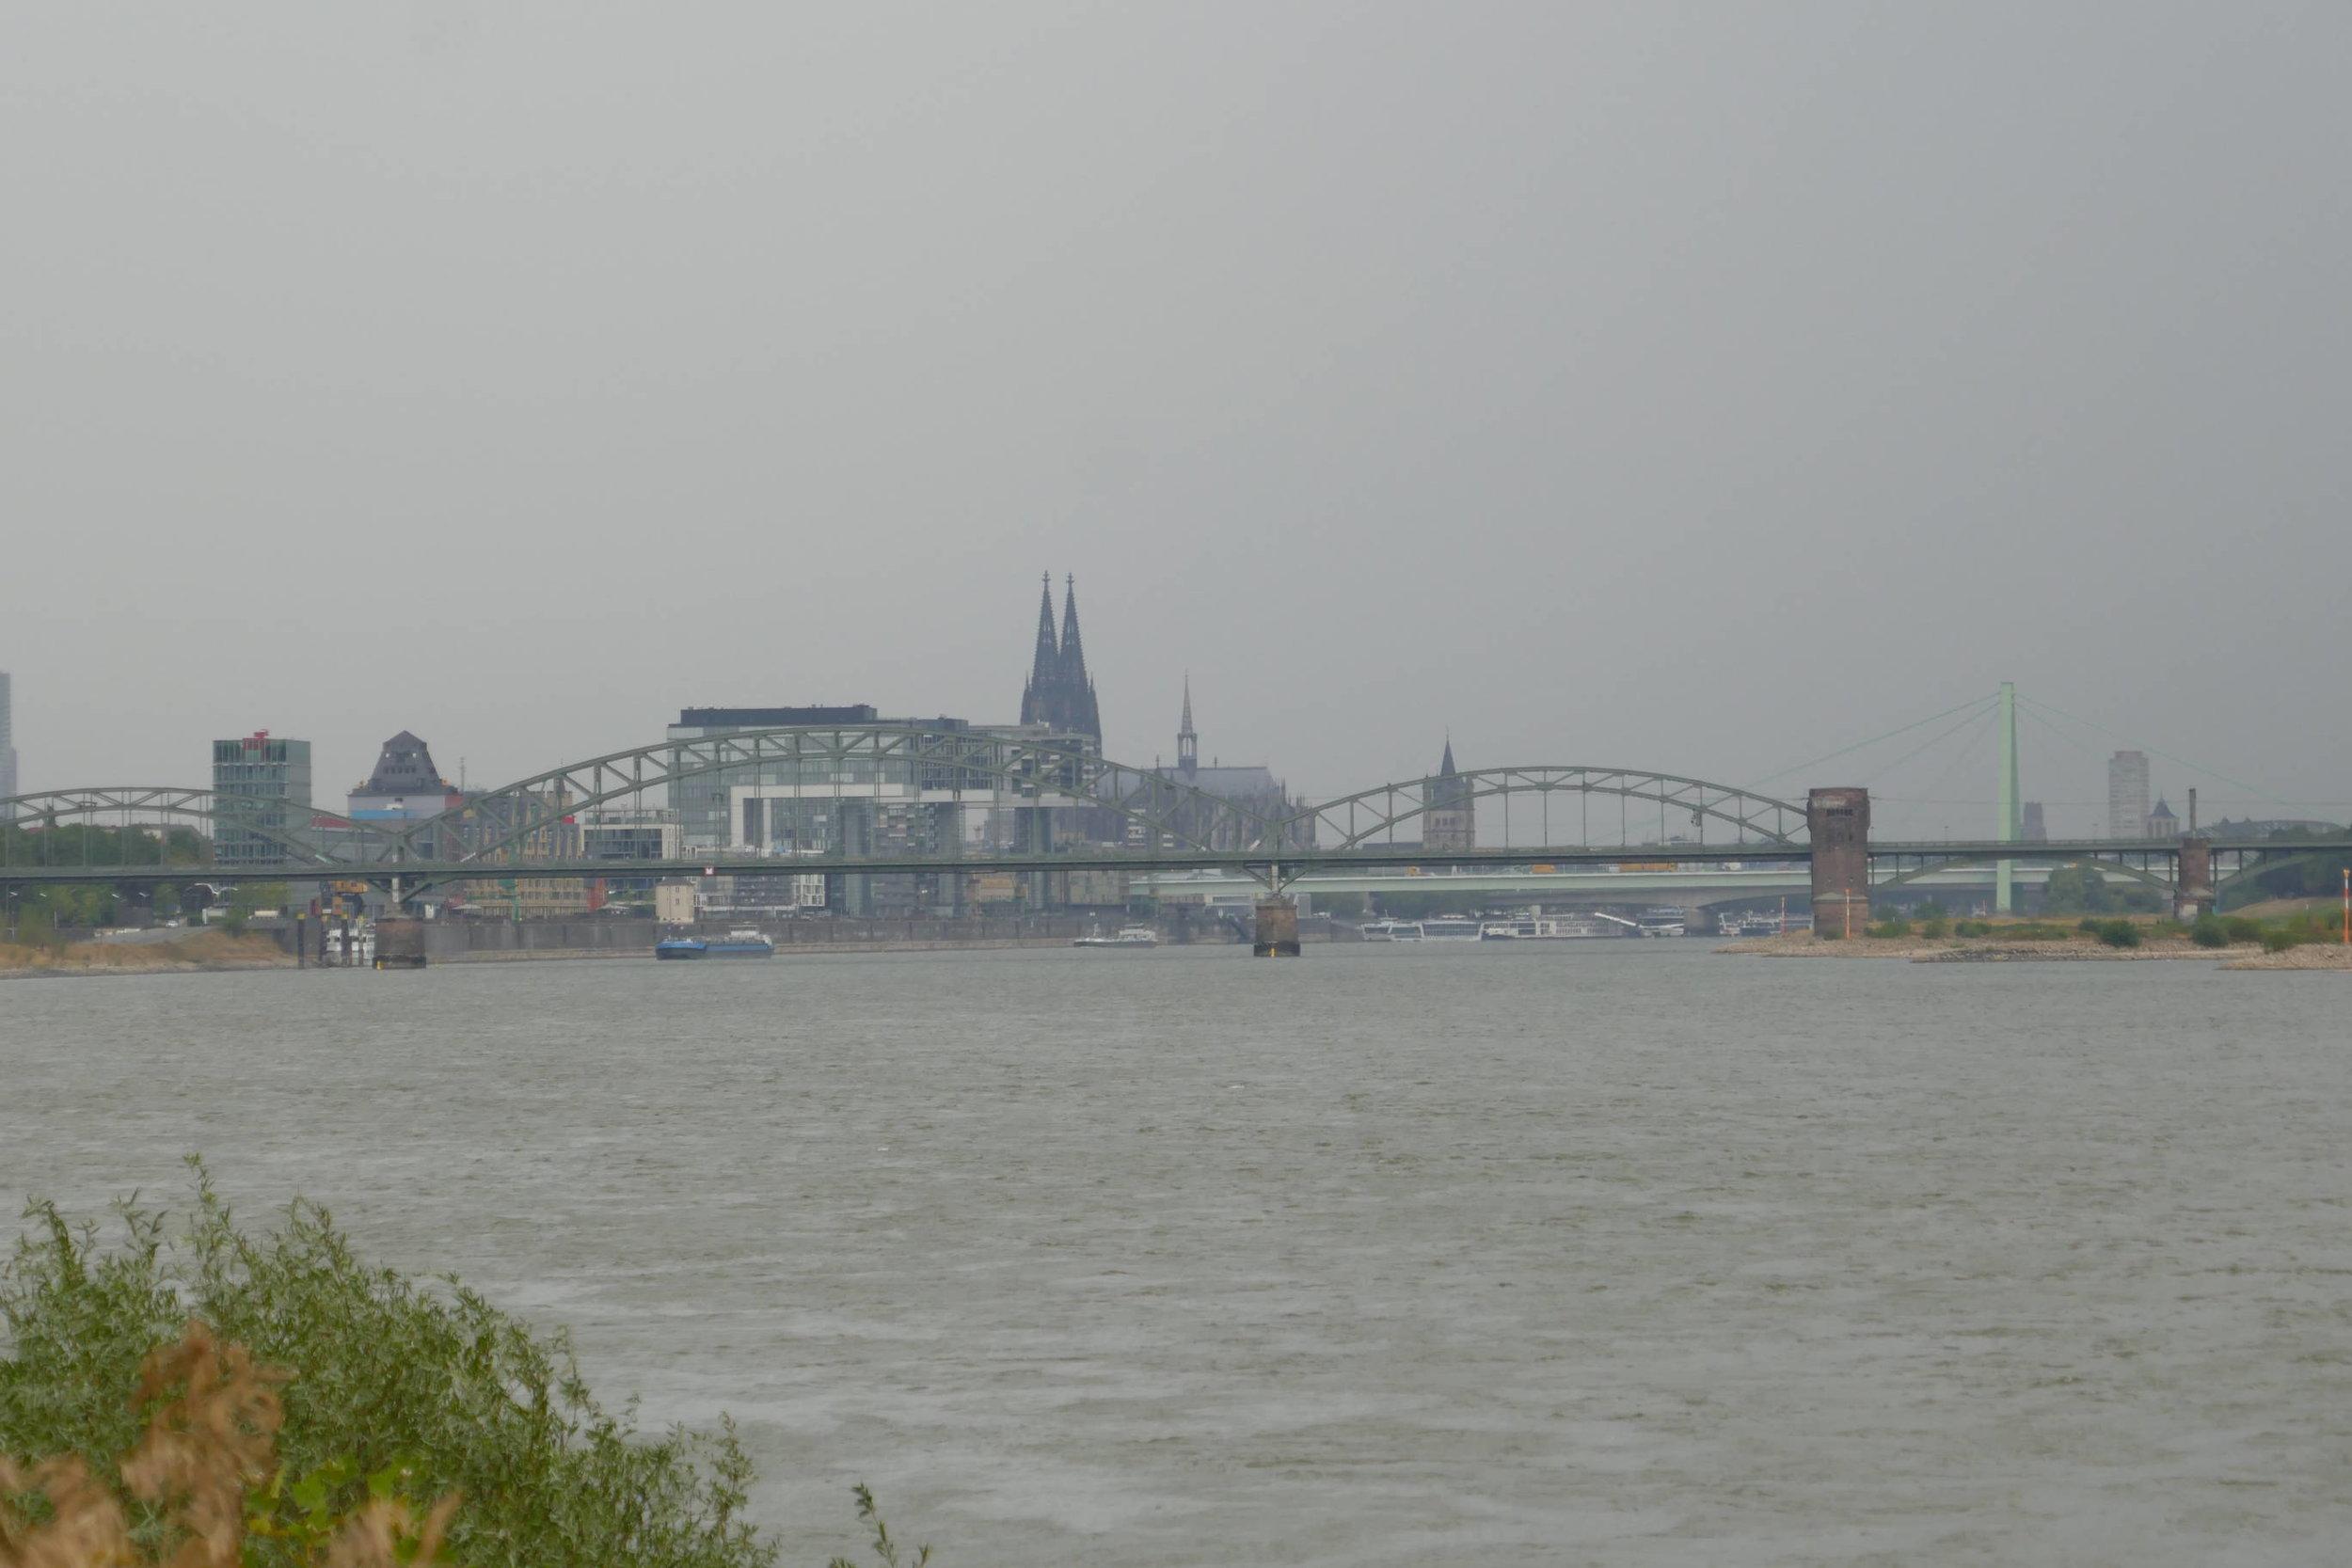 seh ich Köln im Regen...